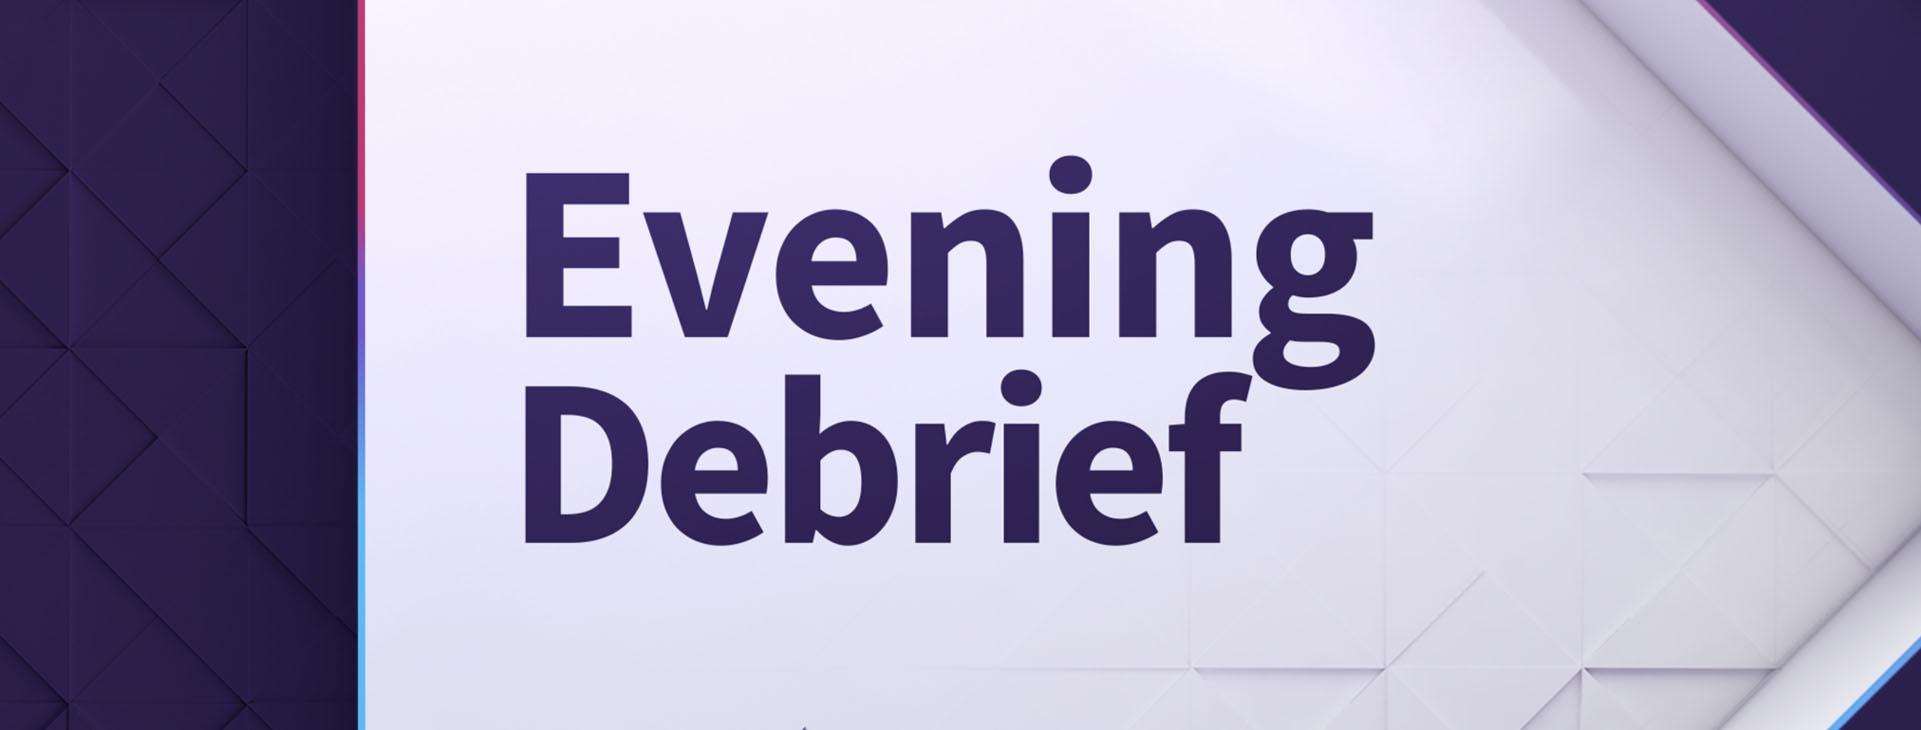 Evening Debrief